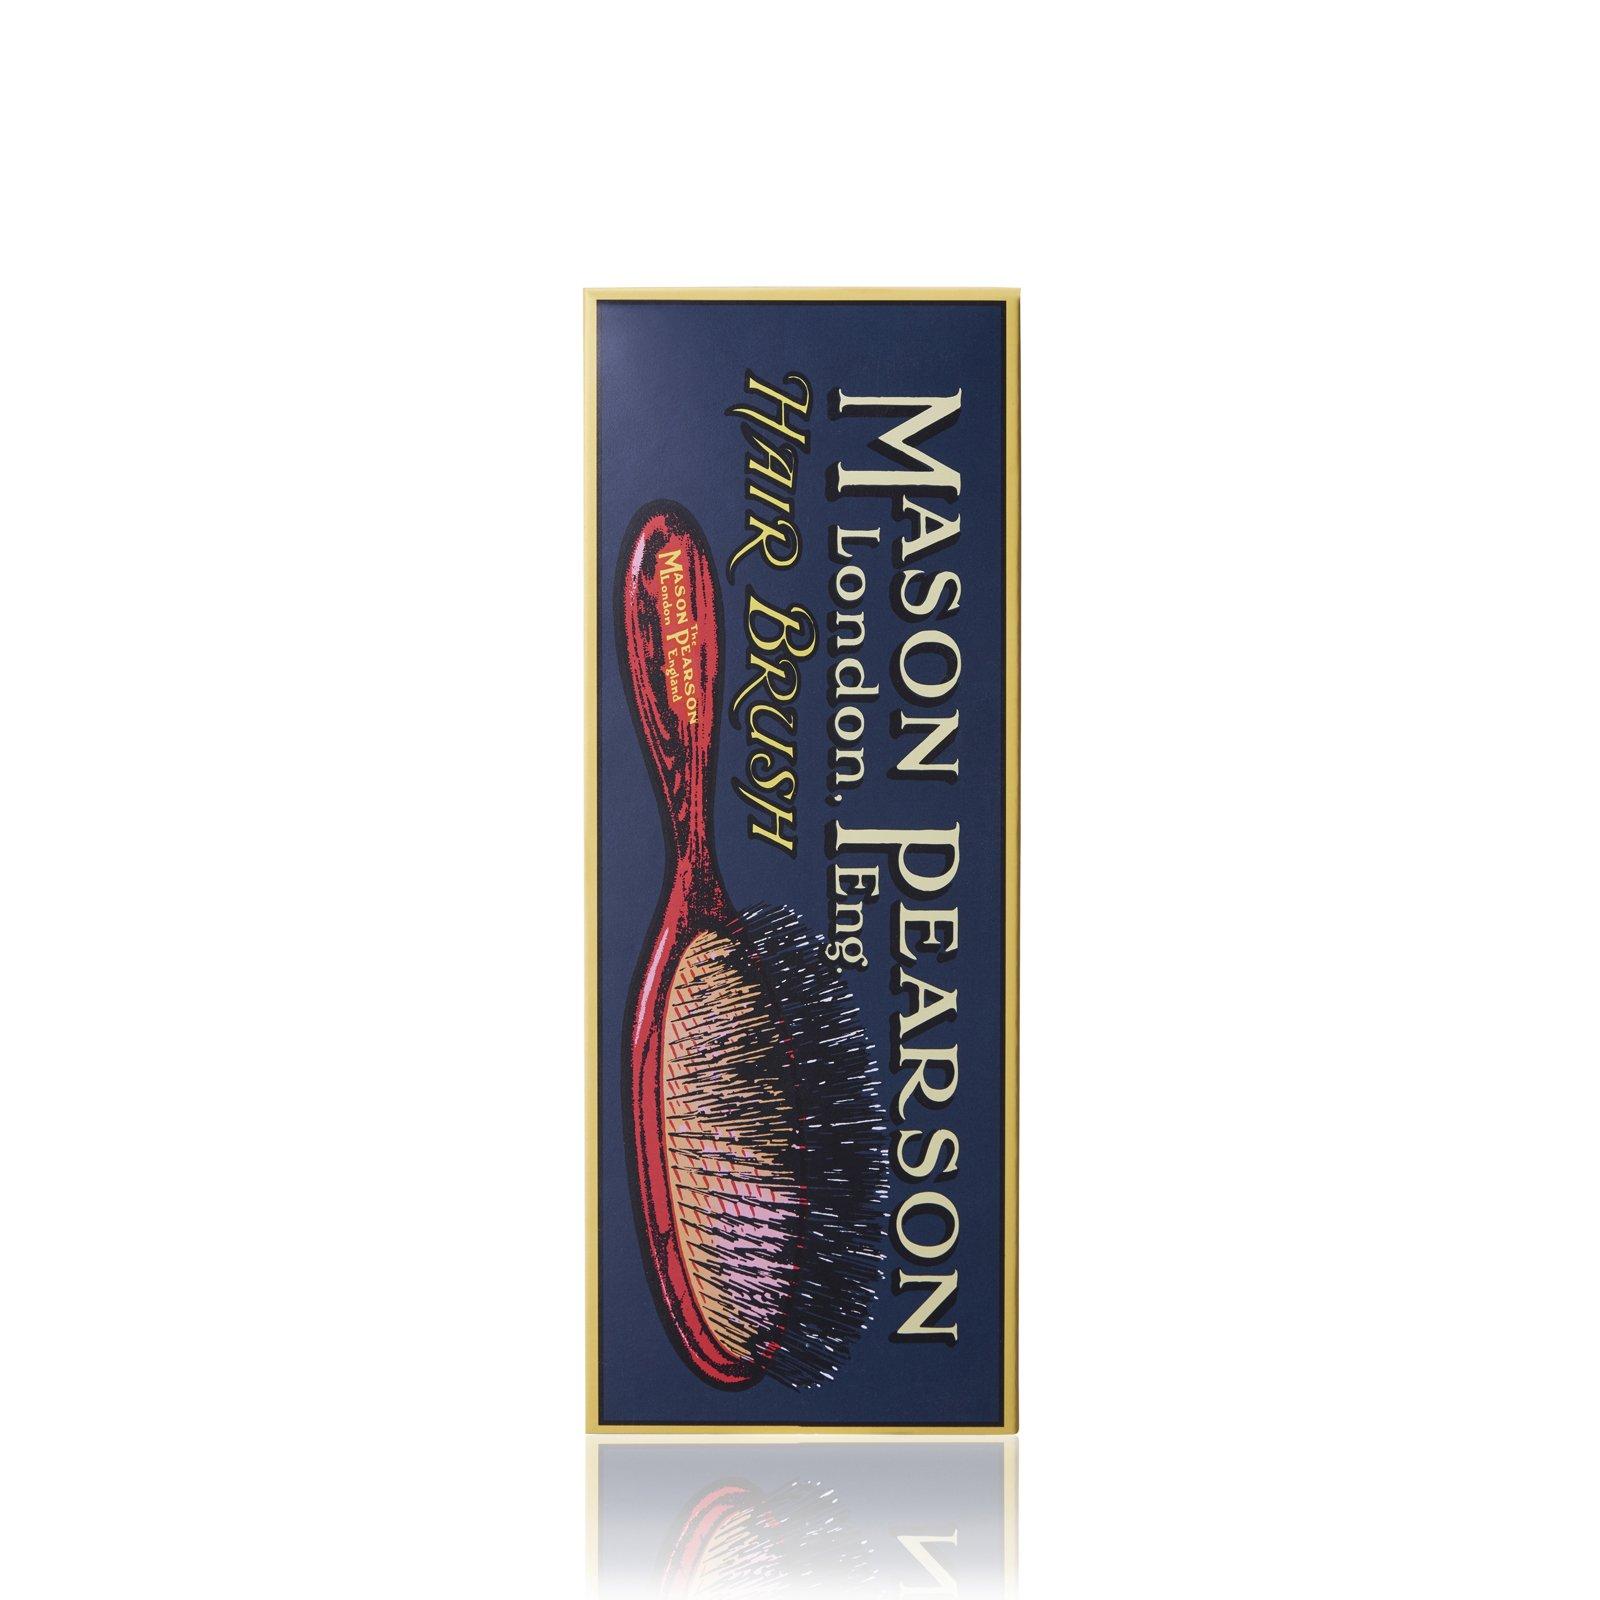 BN1 Popular Hairbrush from Mason Pearson (Wood)